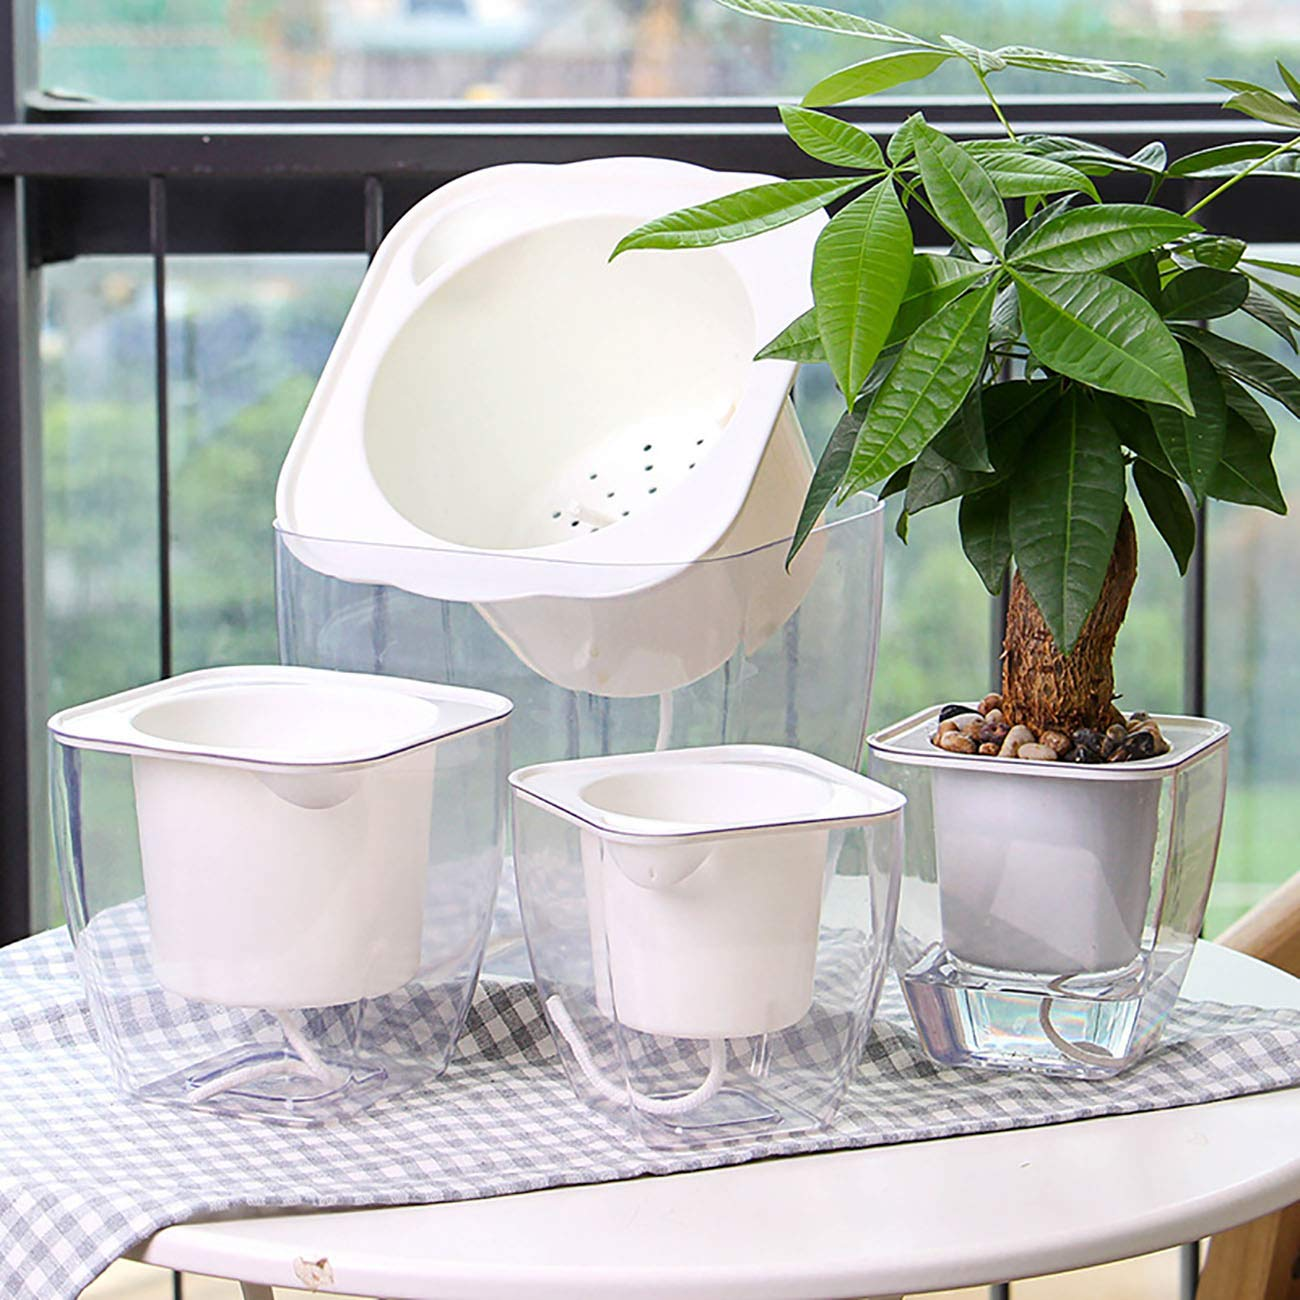 JMsDream Plant Nursery Pots Lazy Flower Pot Automatic Water Absorption